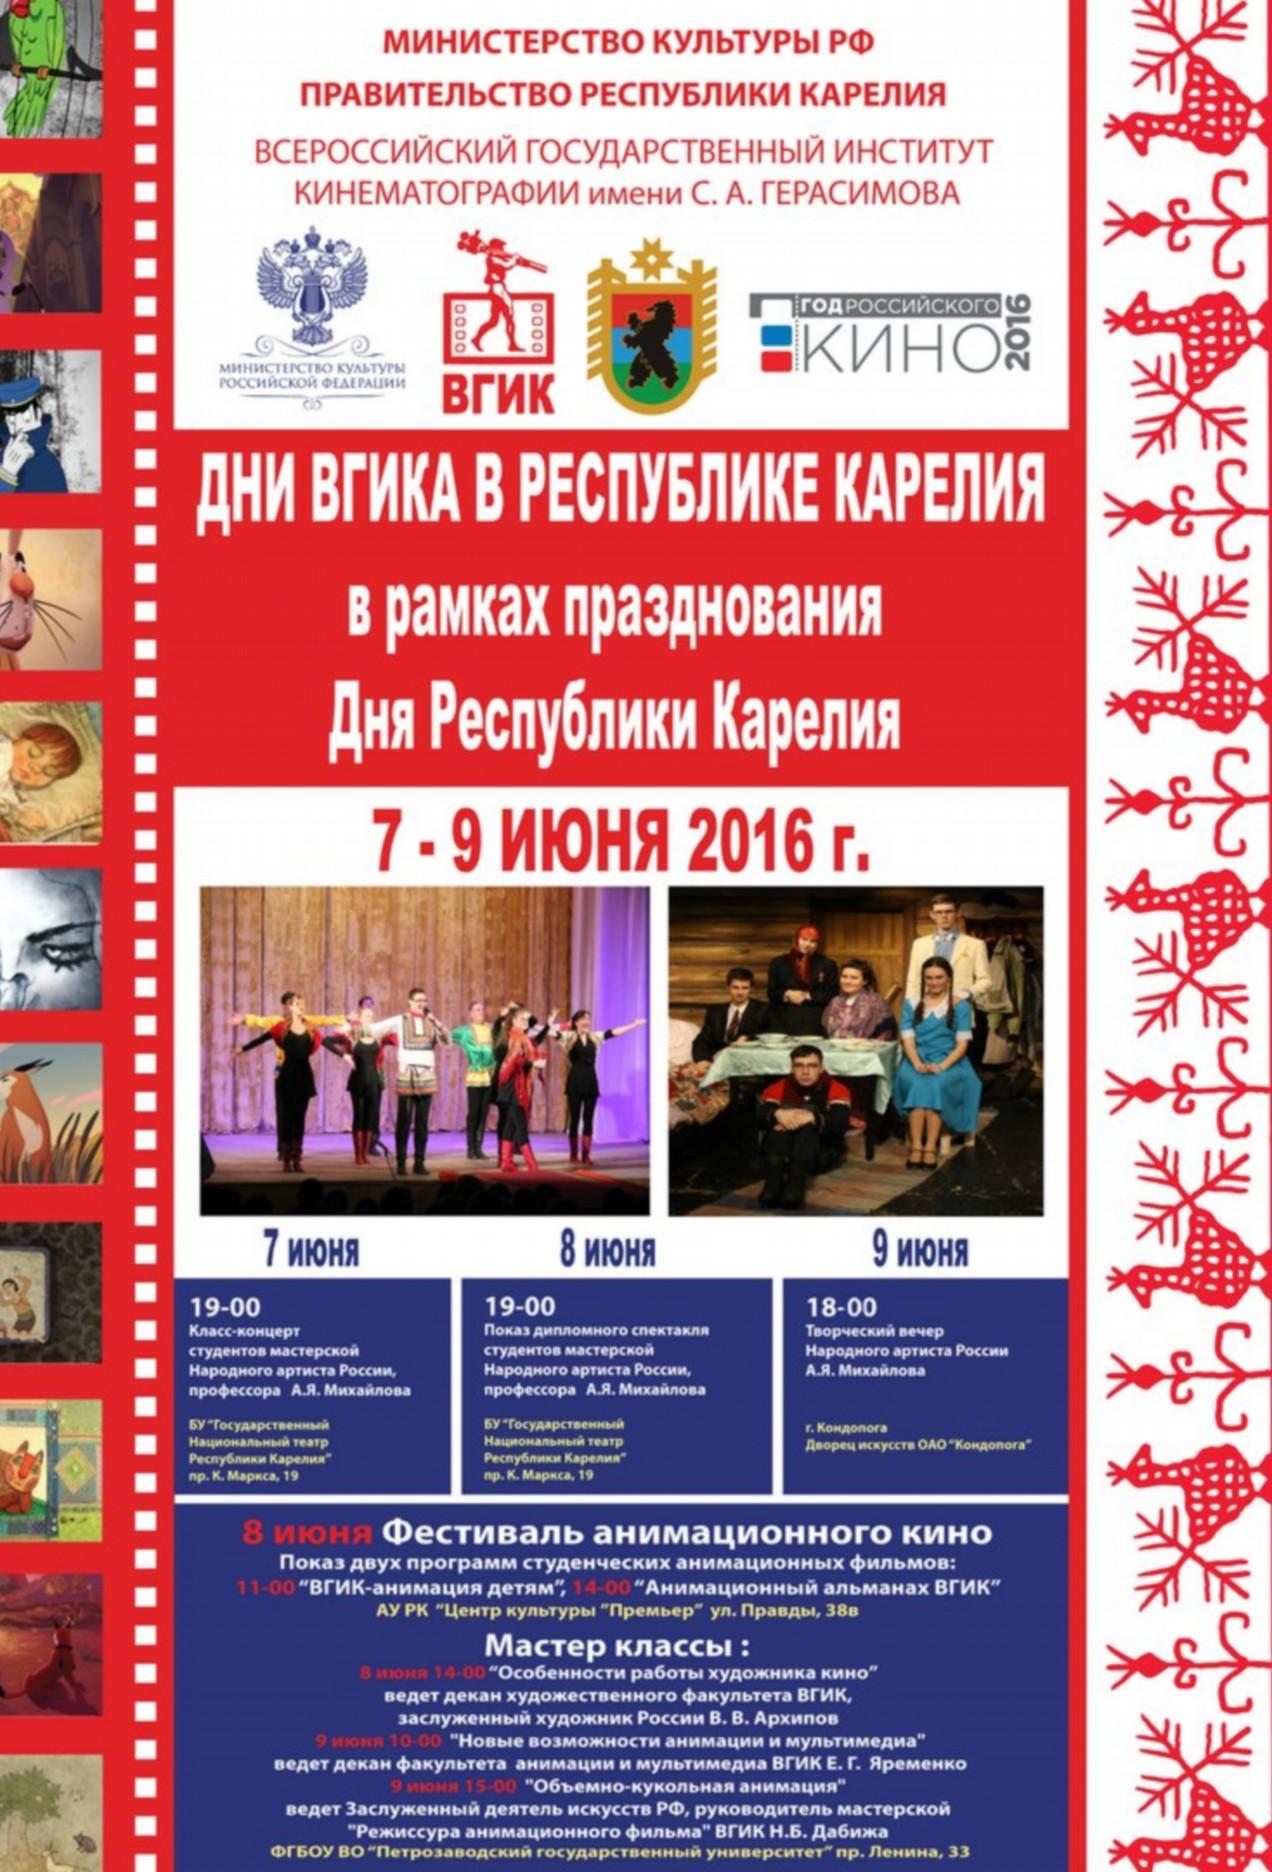 Гороскоп на год Козы 2015 по знакам зодиака картинки